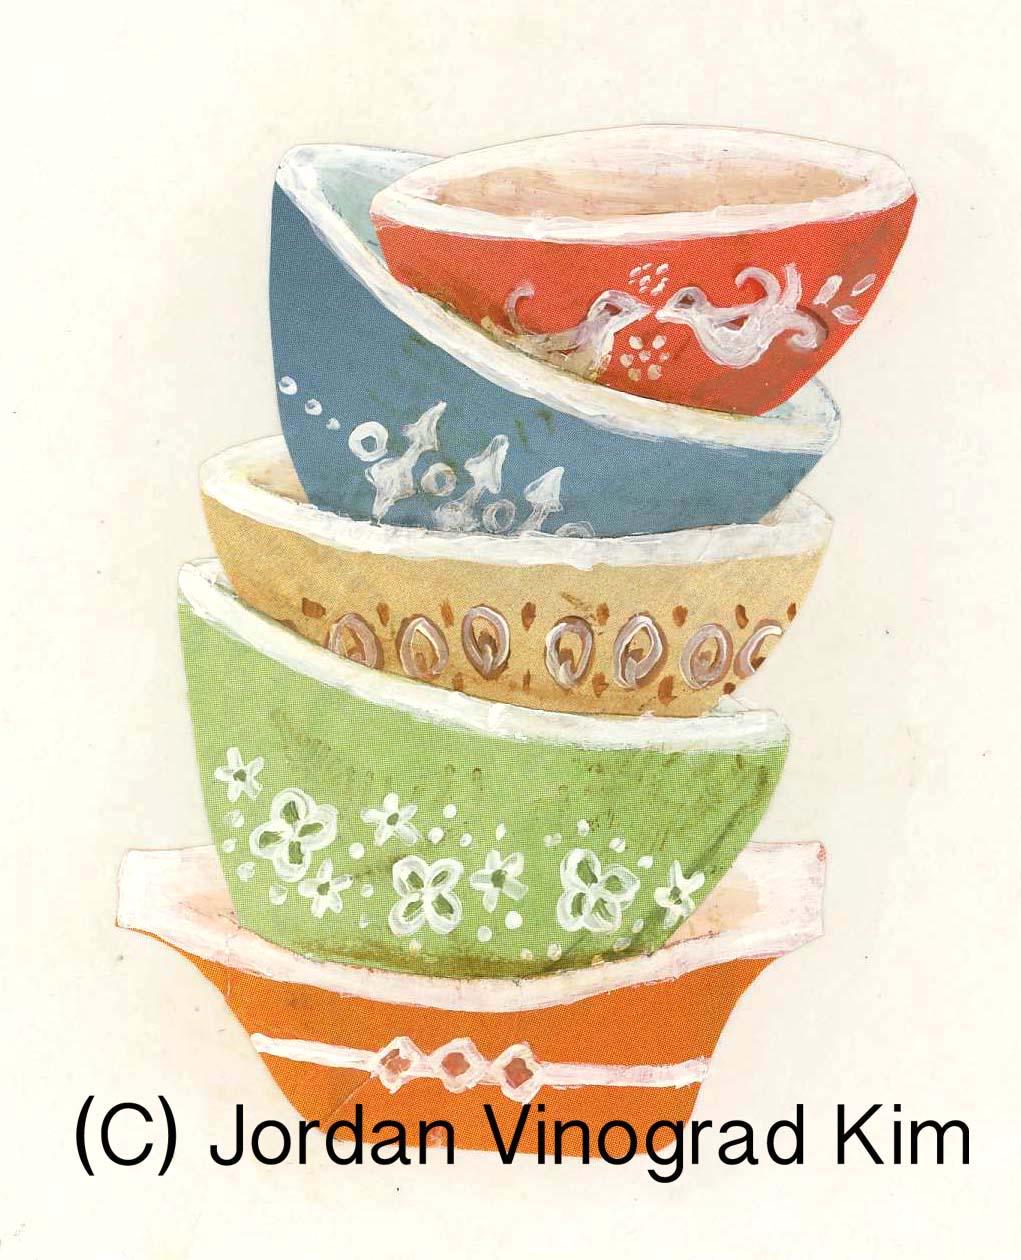 Jordan Vinograd Kim mixed media collage vintage kitchen stacked bowls